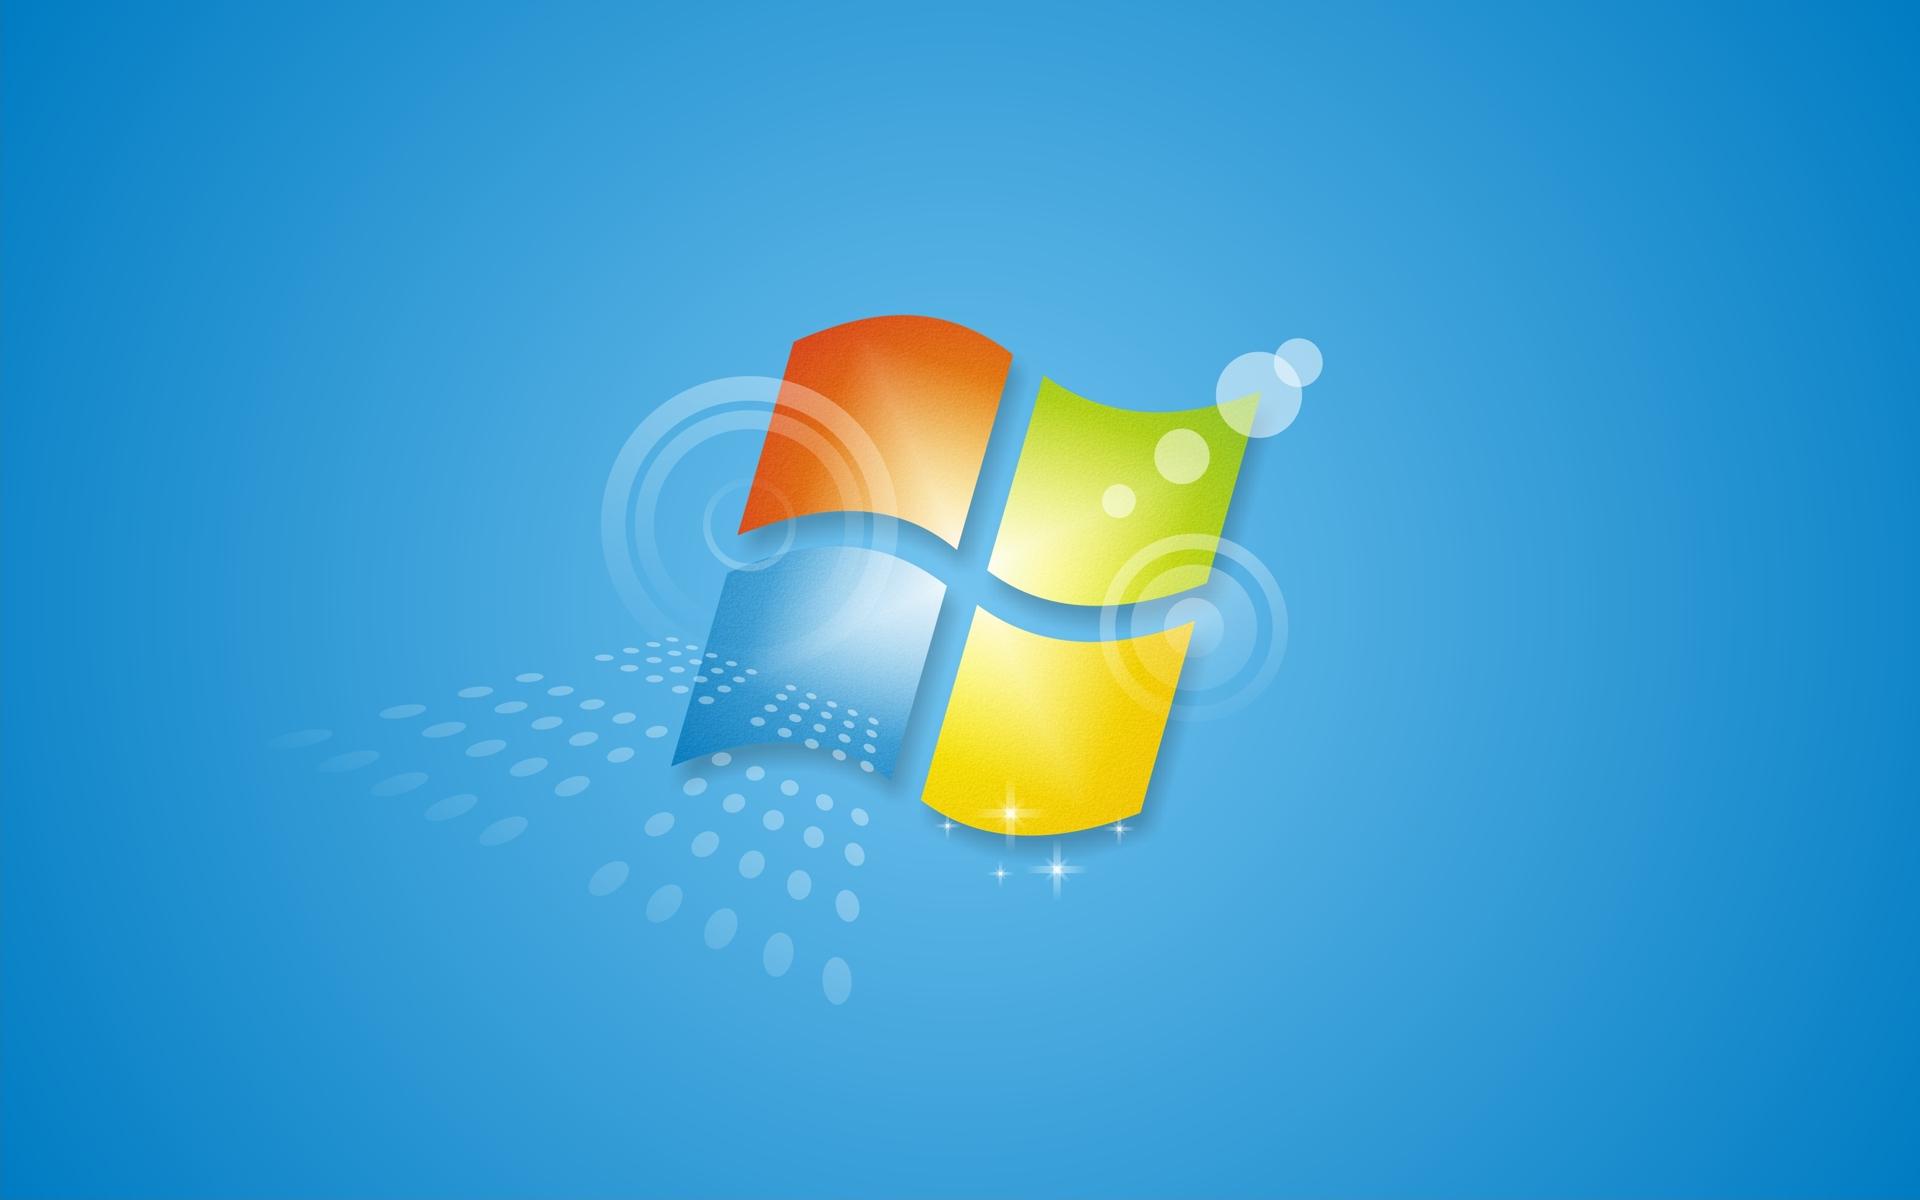 Windows 7 Alternate Blue Wallpapers HD Wallpapers 1920x1200